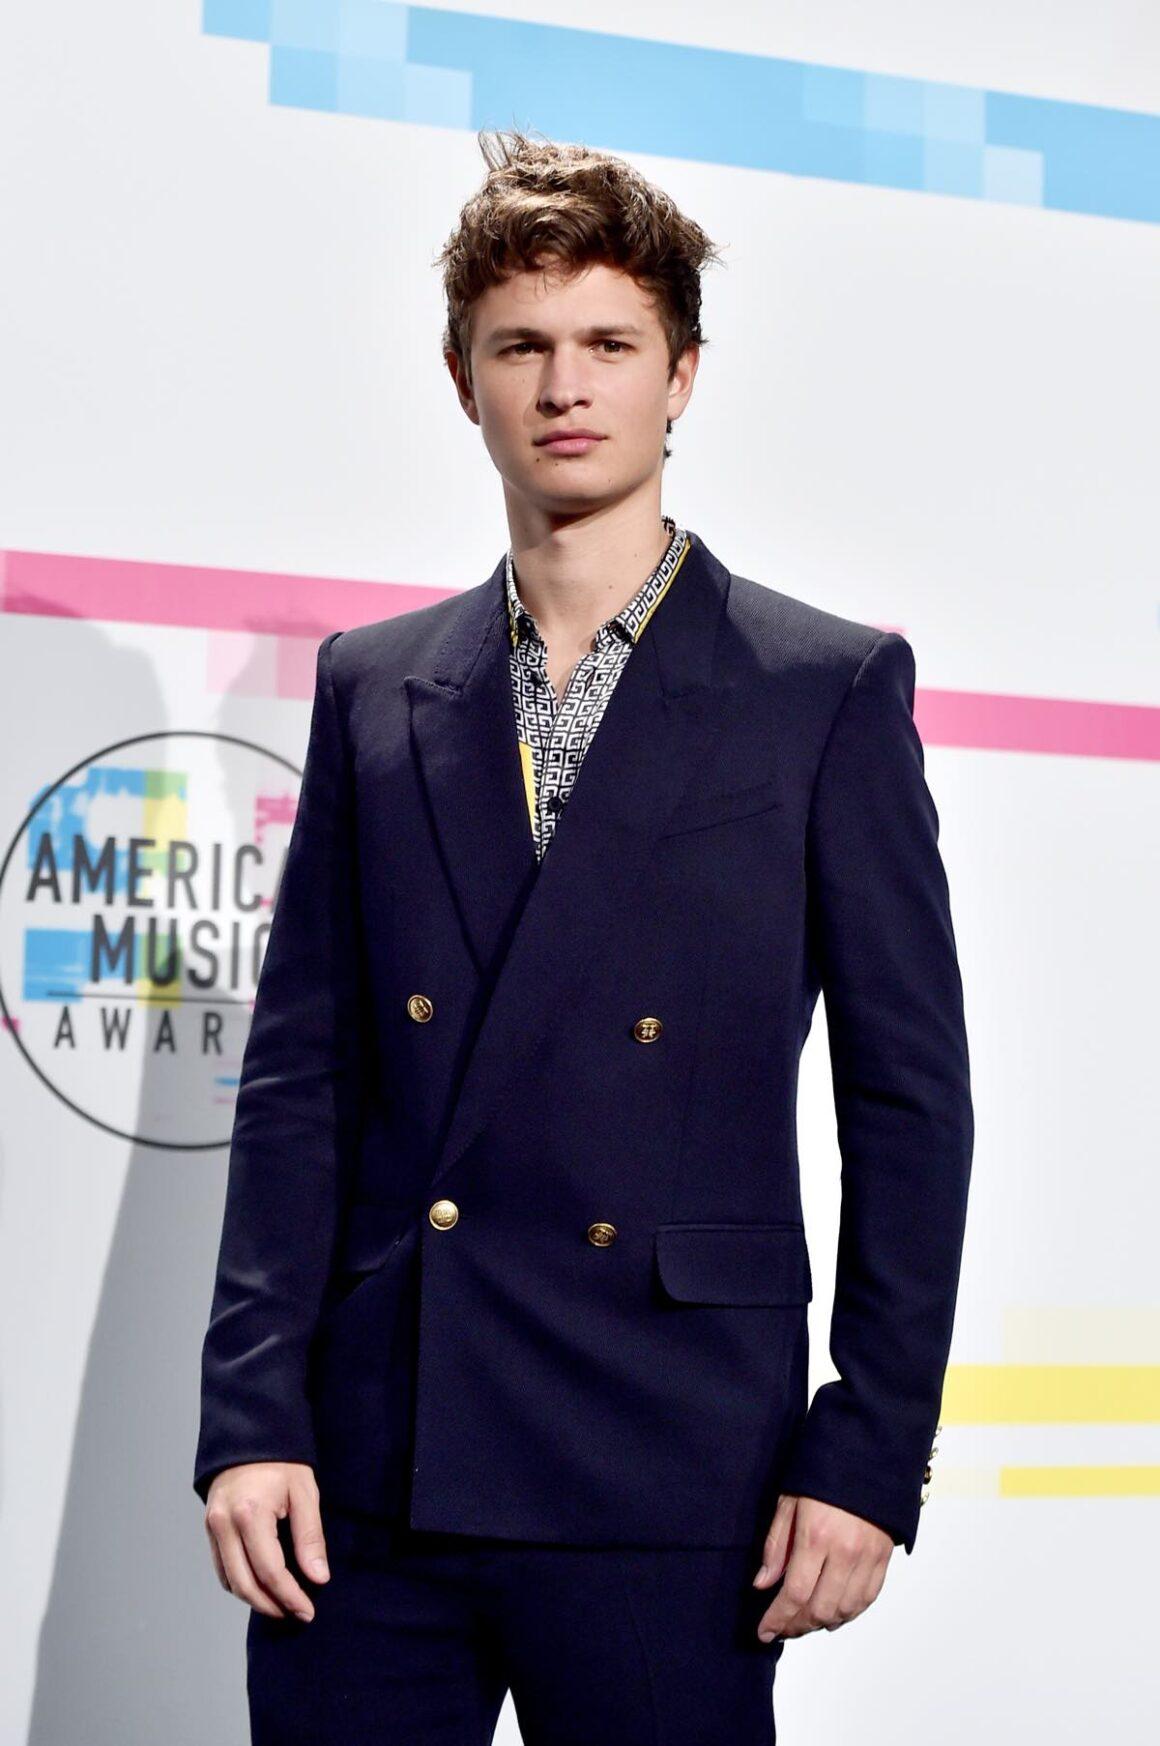 Ansel Elgort attends 2017 American Music Awards - Press Room